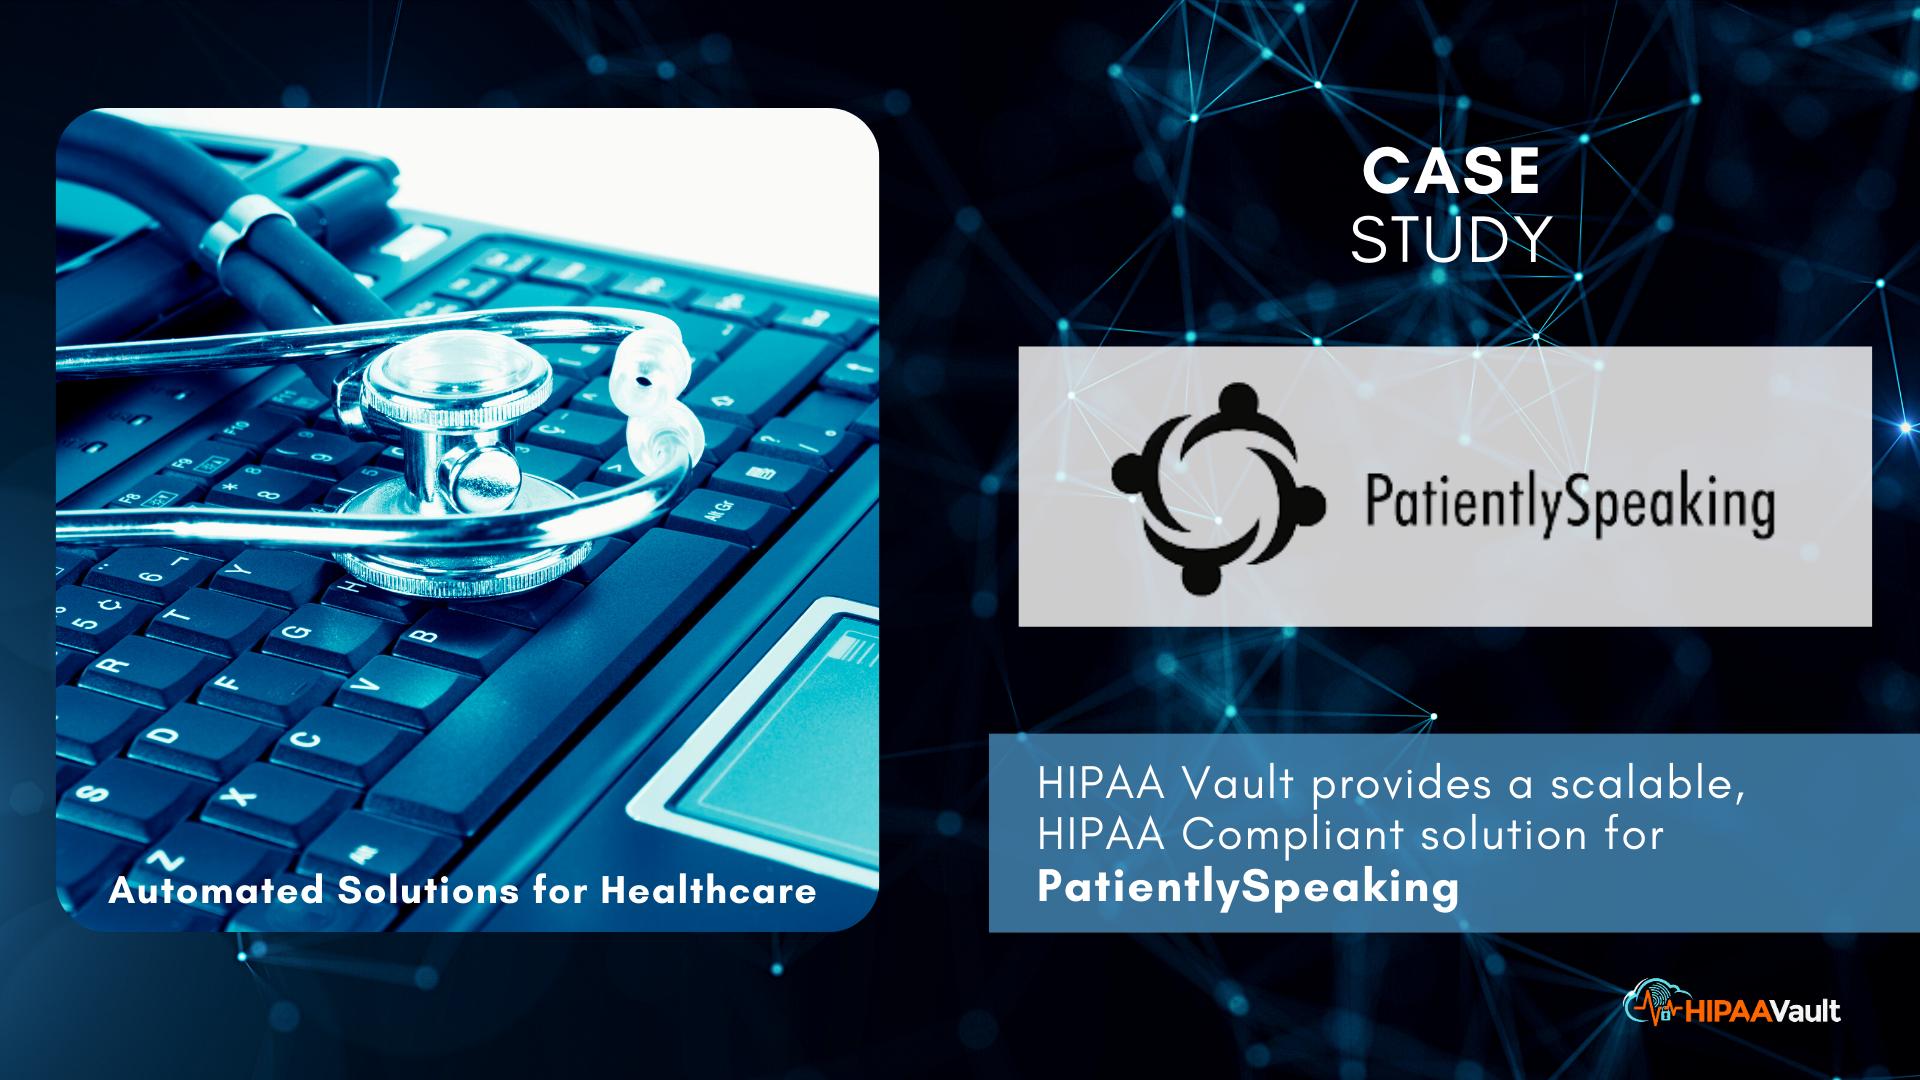 PatientlySpeaking – A HIPAA Vault Case Study